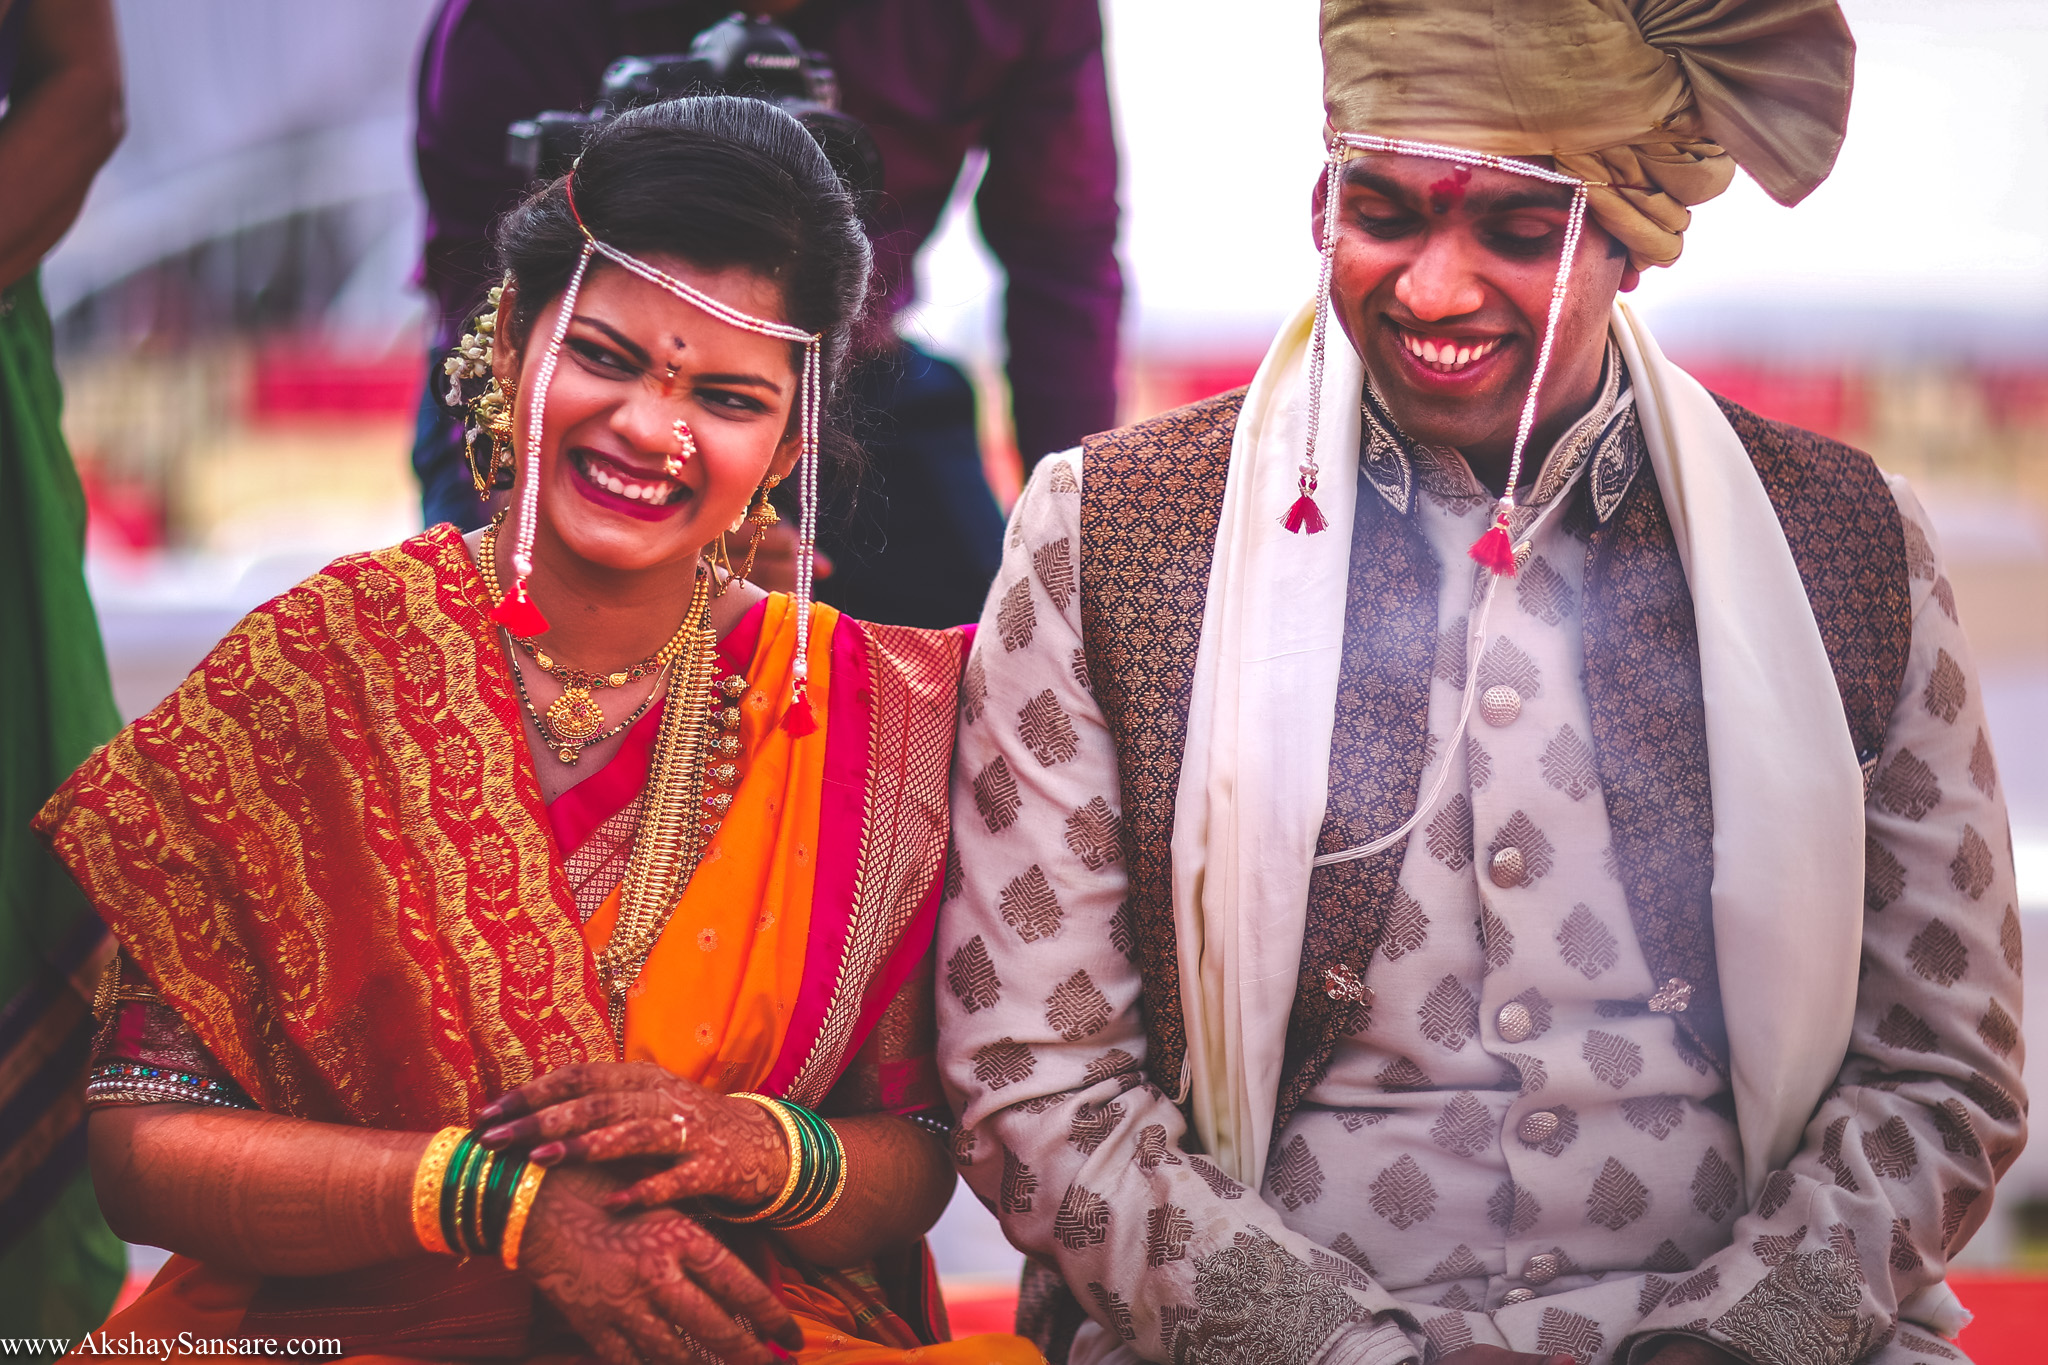 Salil x Kimaya Akshay Sansare Photography Candid wedding Photographer in mumbai best(28).jpg